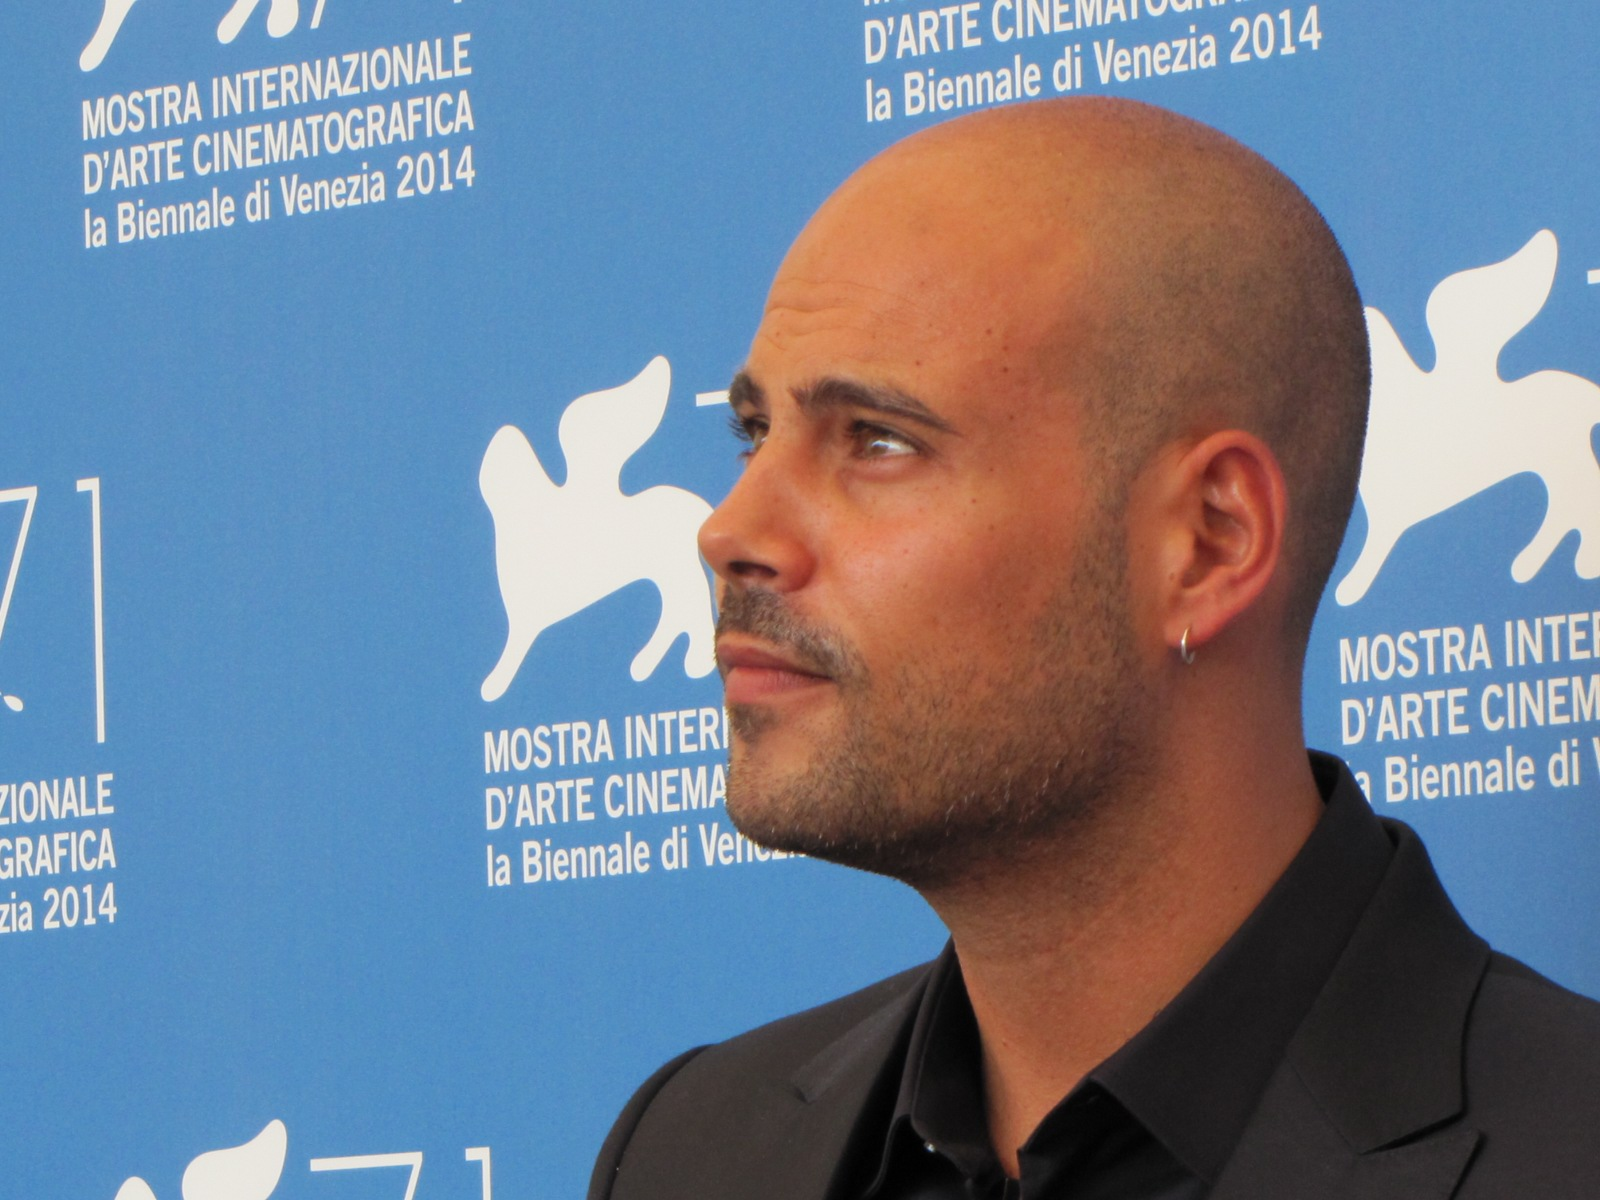 'Perez' a Venezia 2014 - Marco D'amore